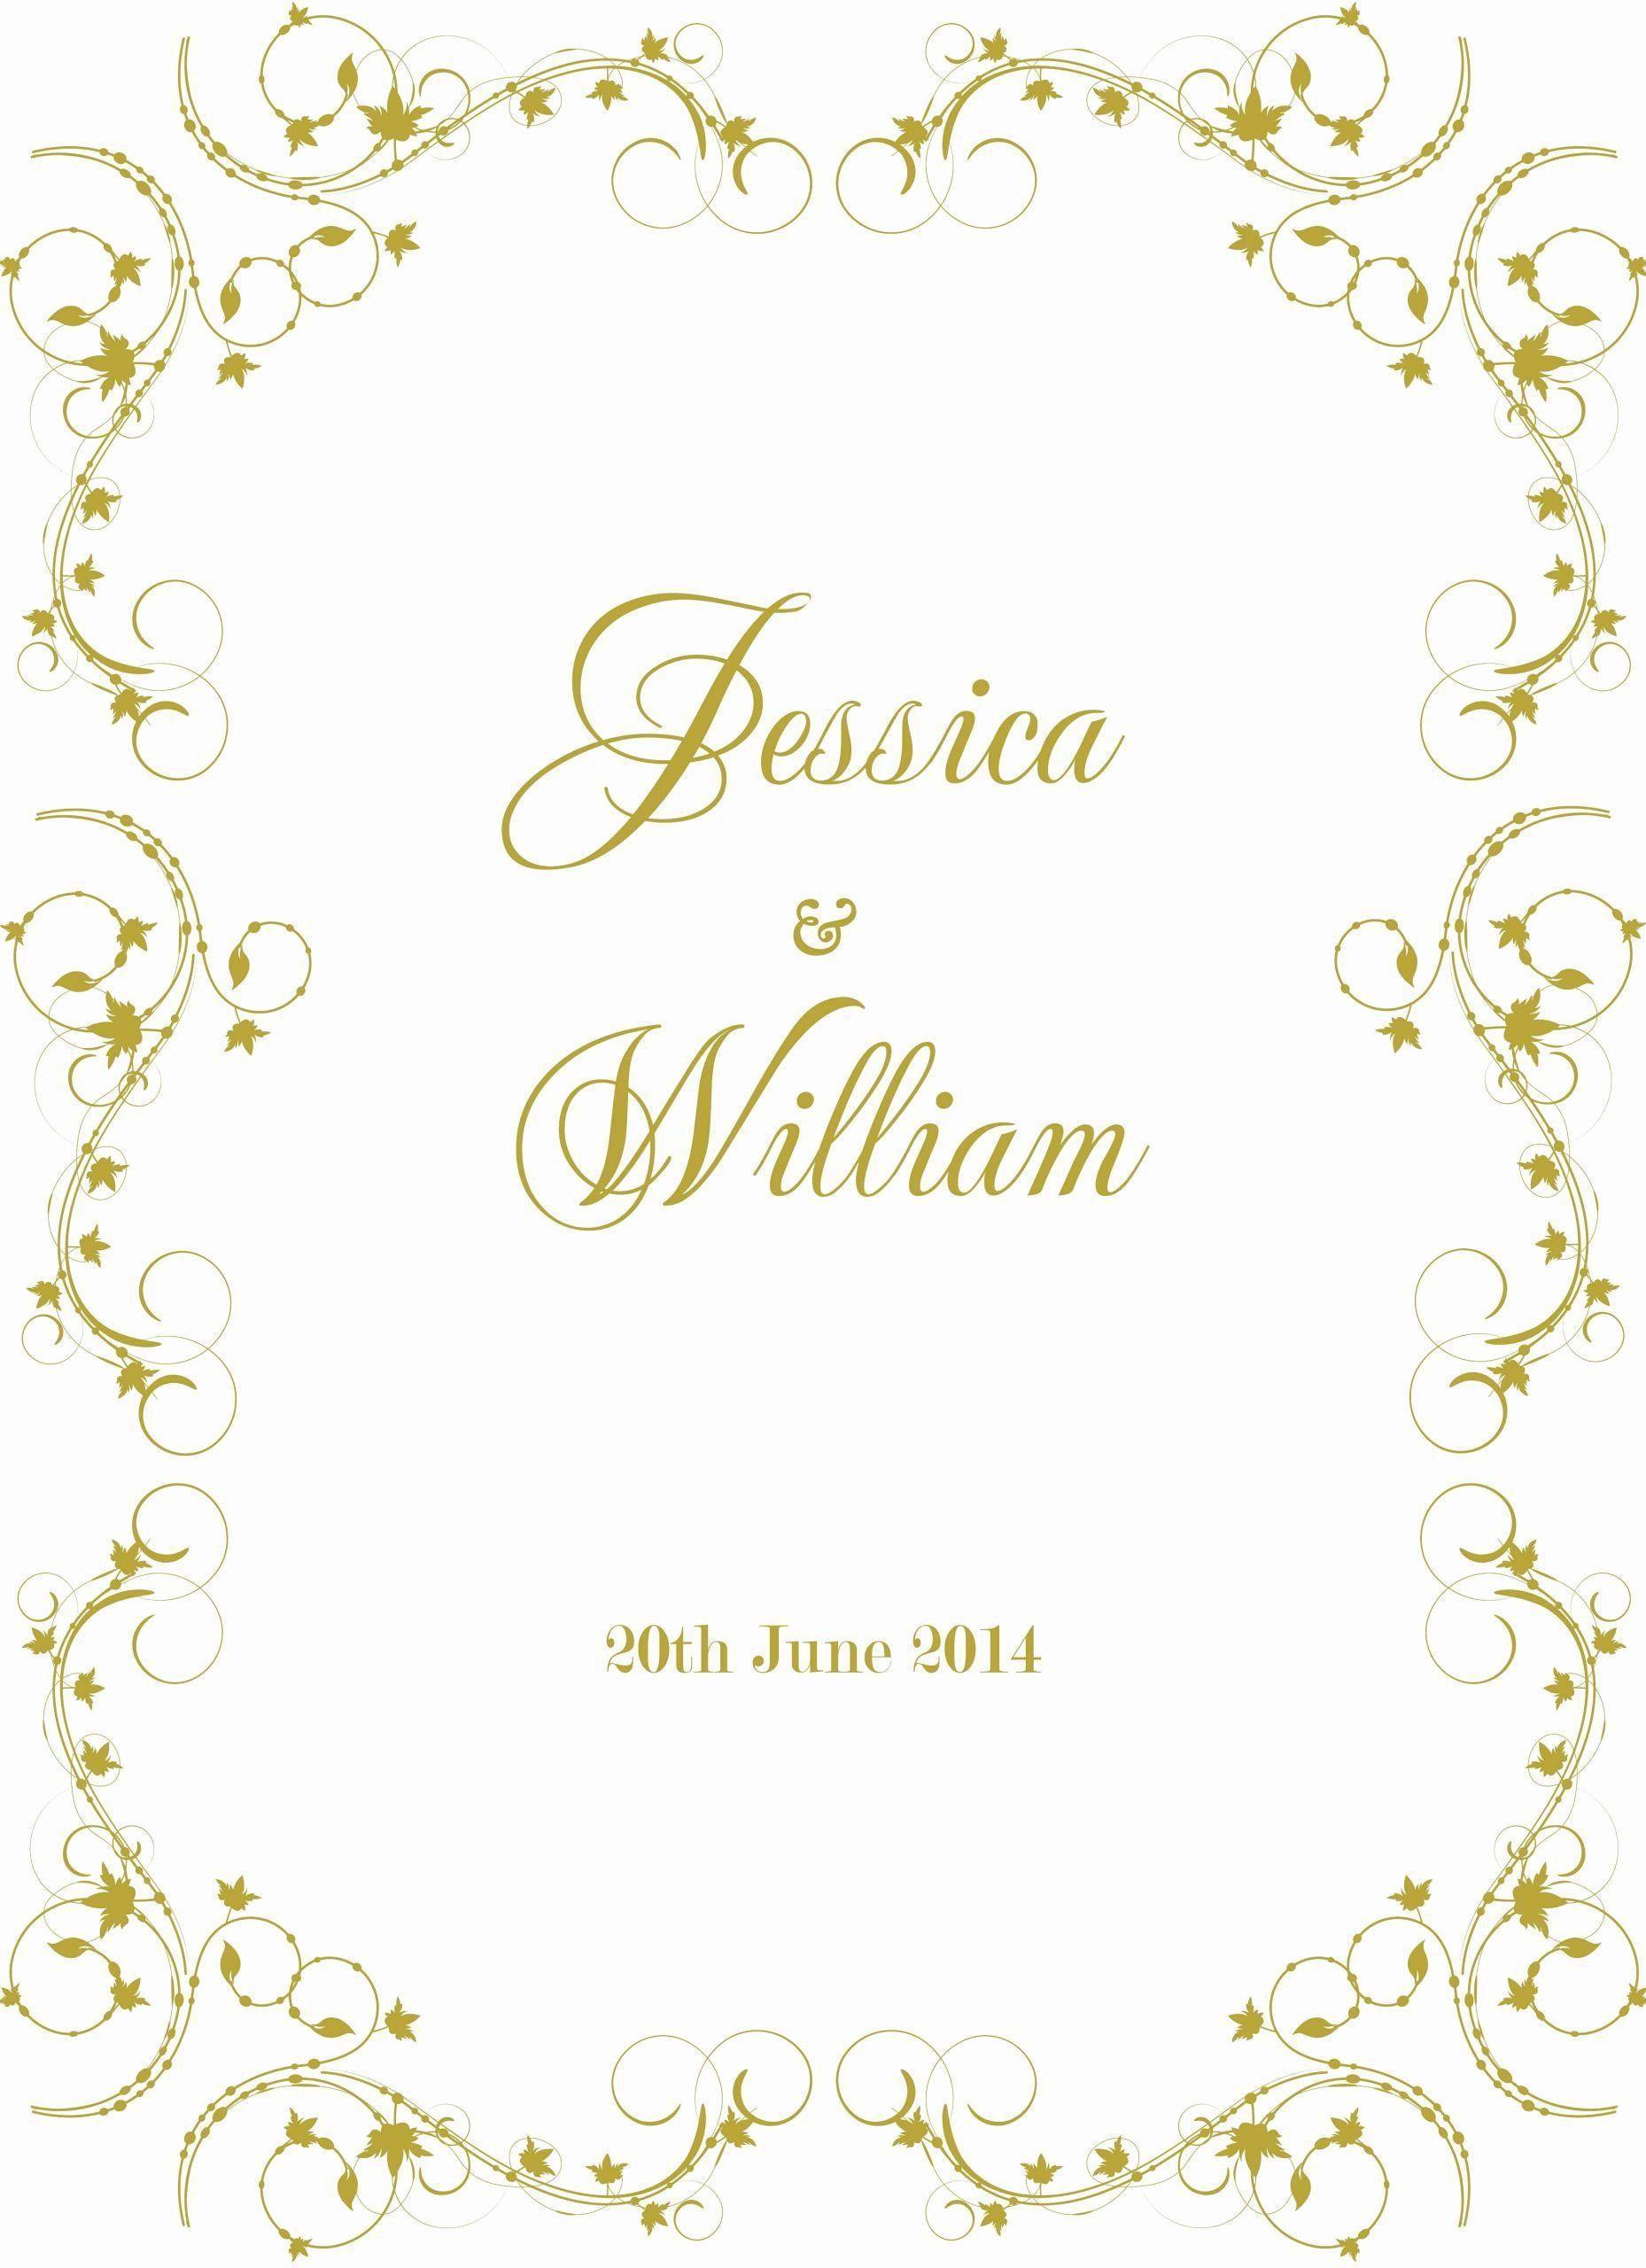 001 Striking Formal Wedding Invitation Template Free Image Full